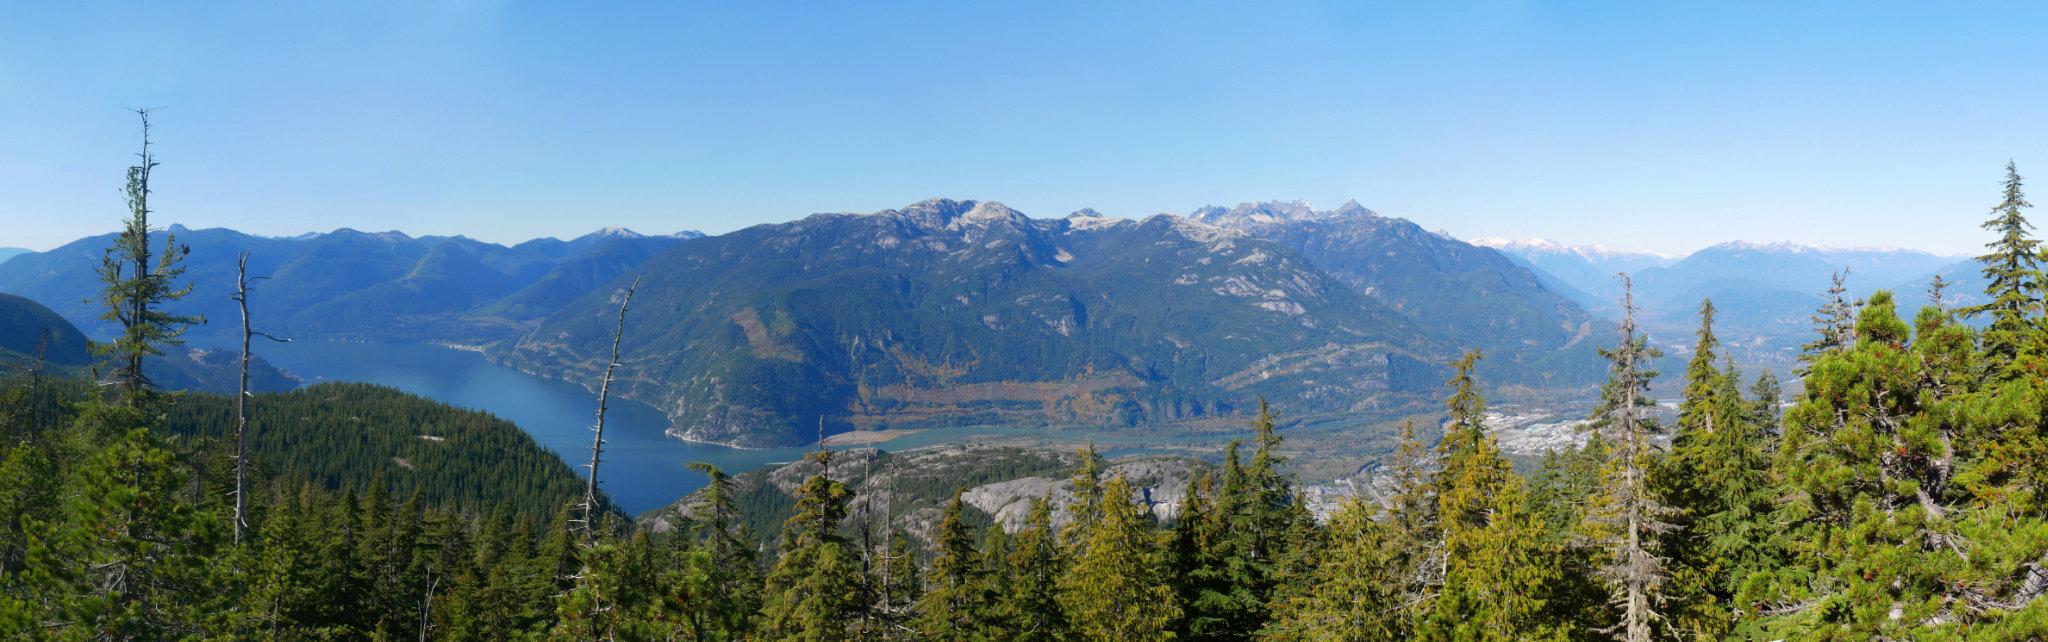 Al's Habrich ridge trail panorama halfway